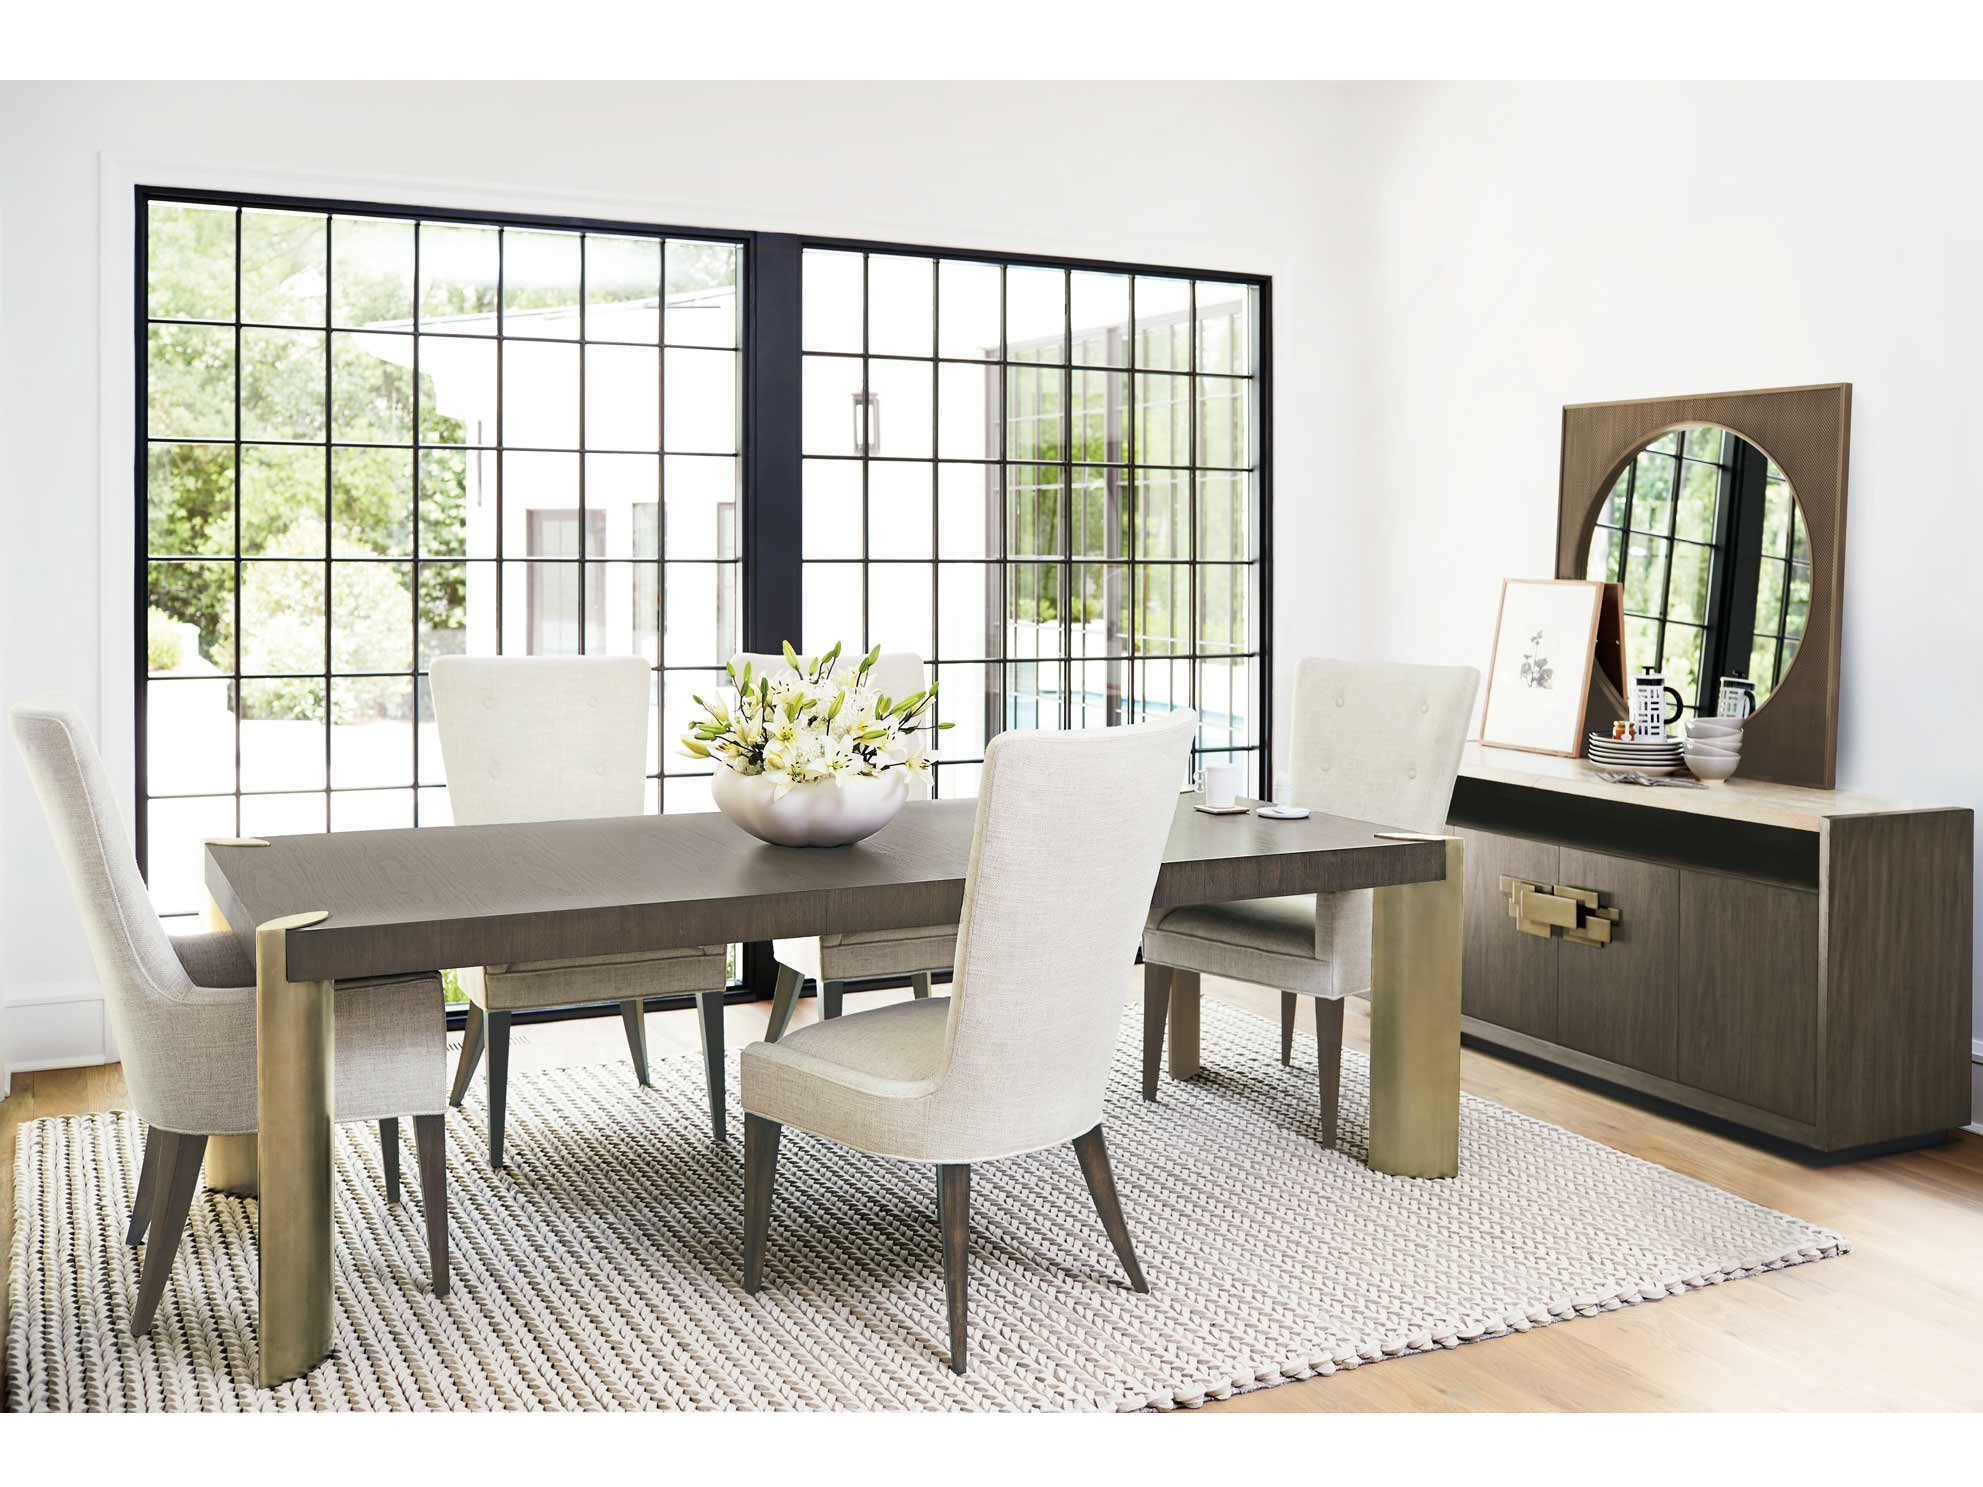 Bernhardt Profile Dining Room Set | BH378222SET1